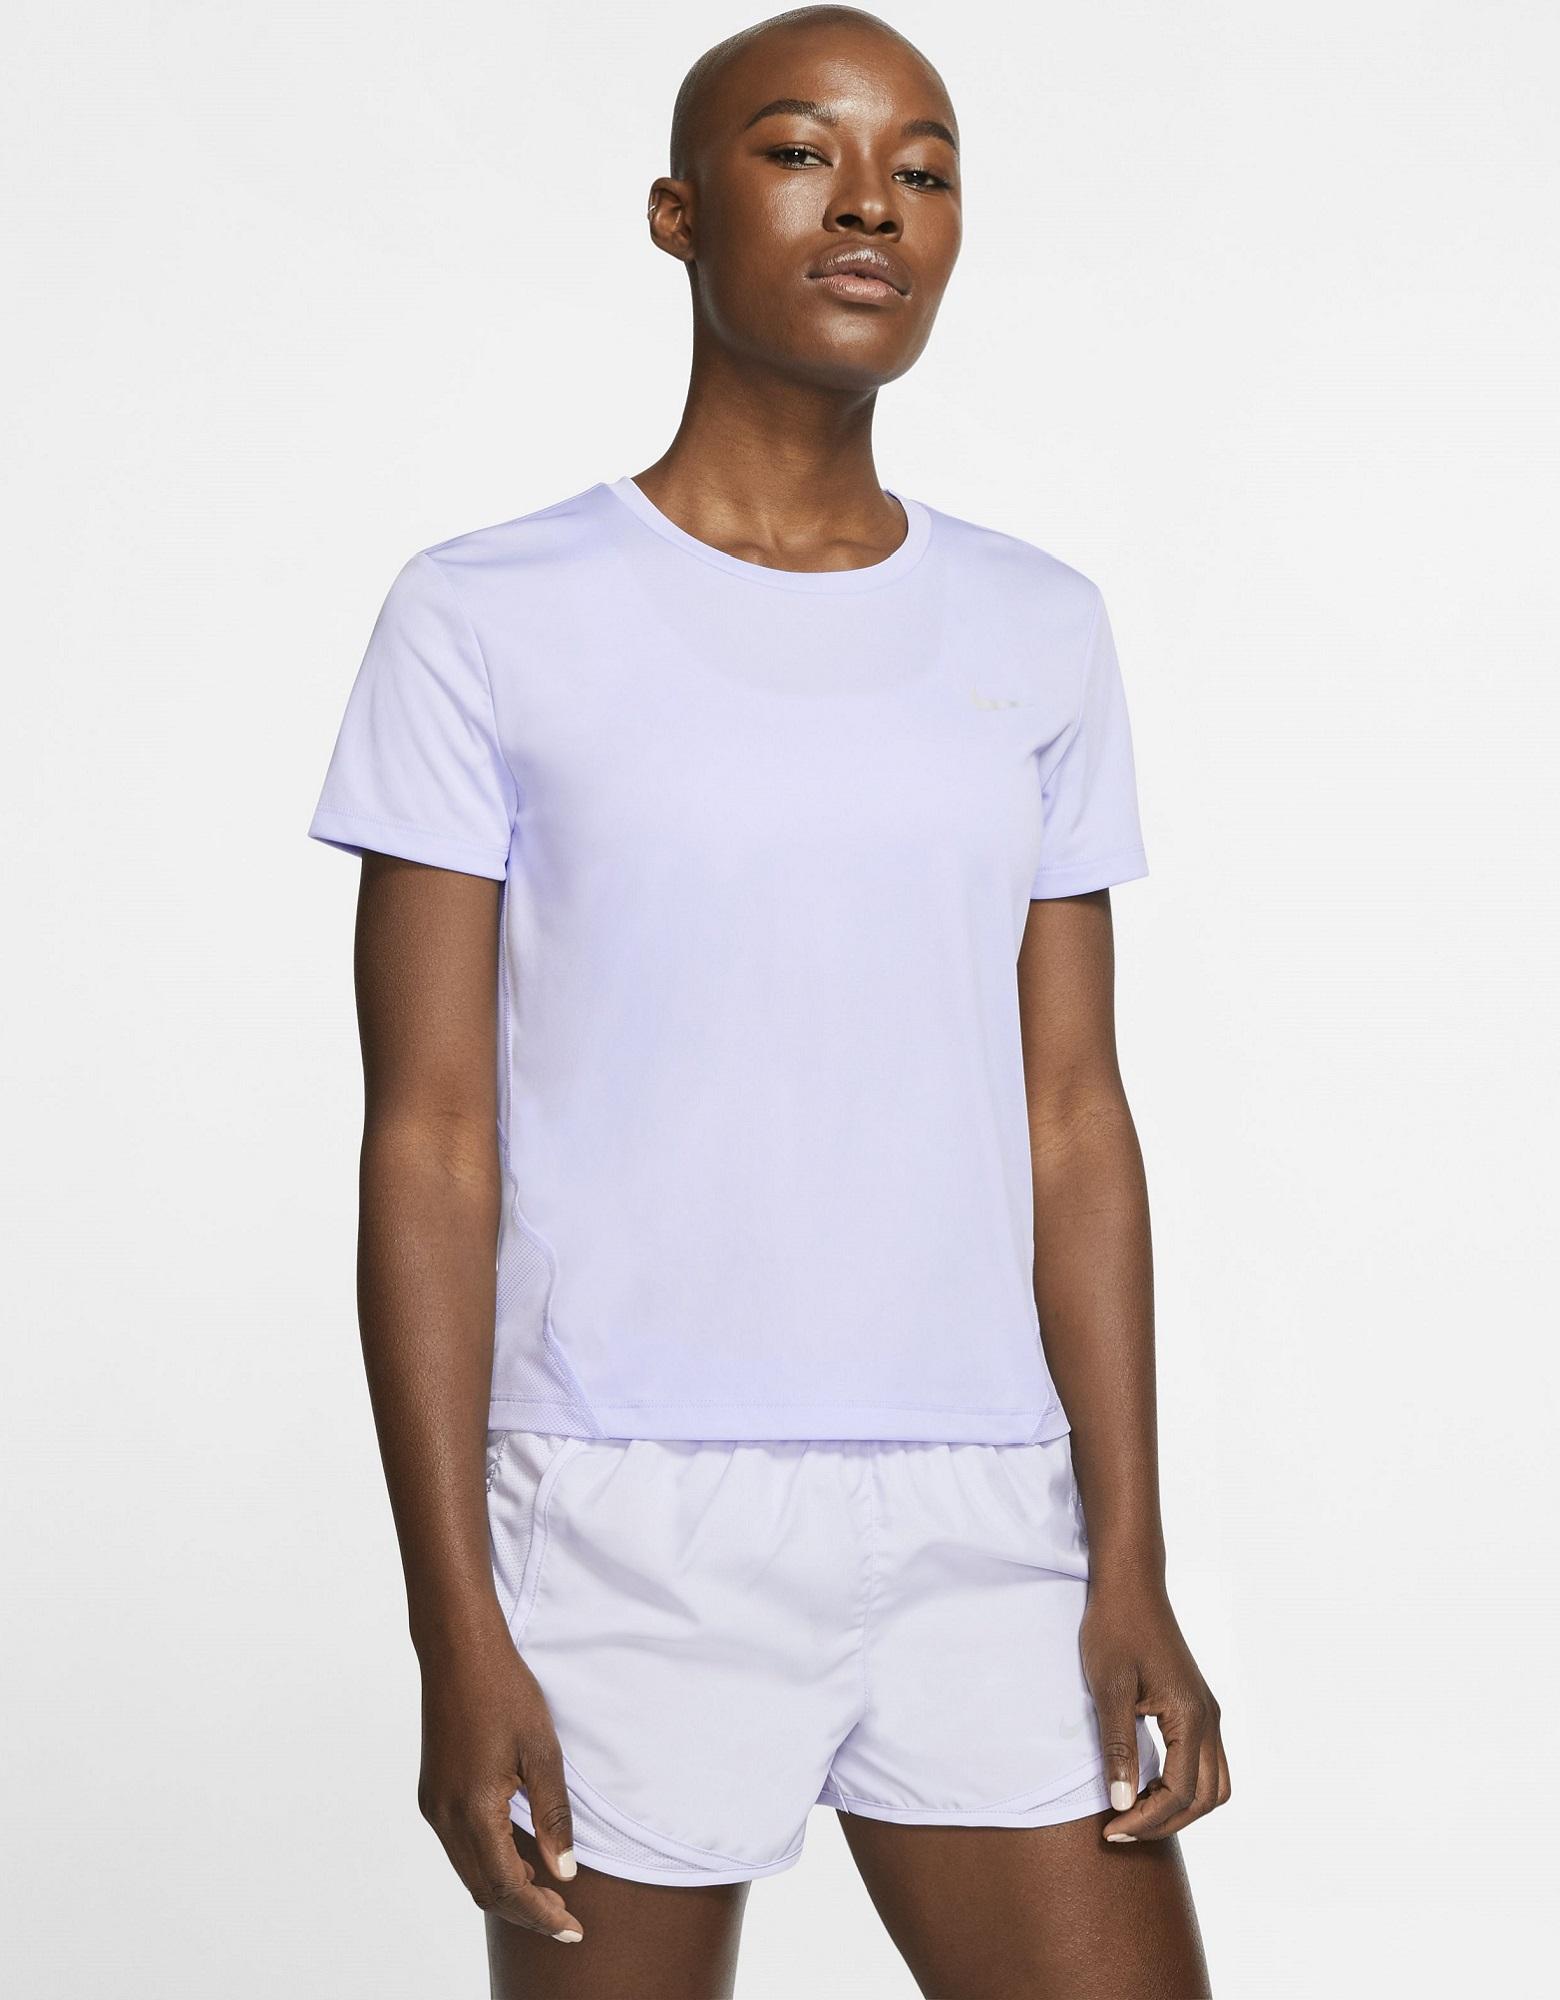 Nike Футболка женская Nike Miler, размер 46-48 nike футболка мужская nike cool miler